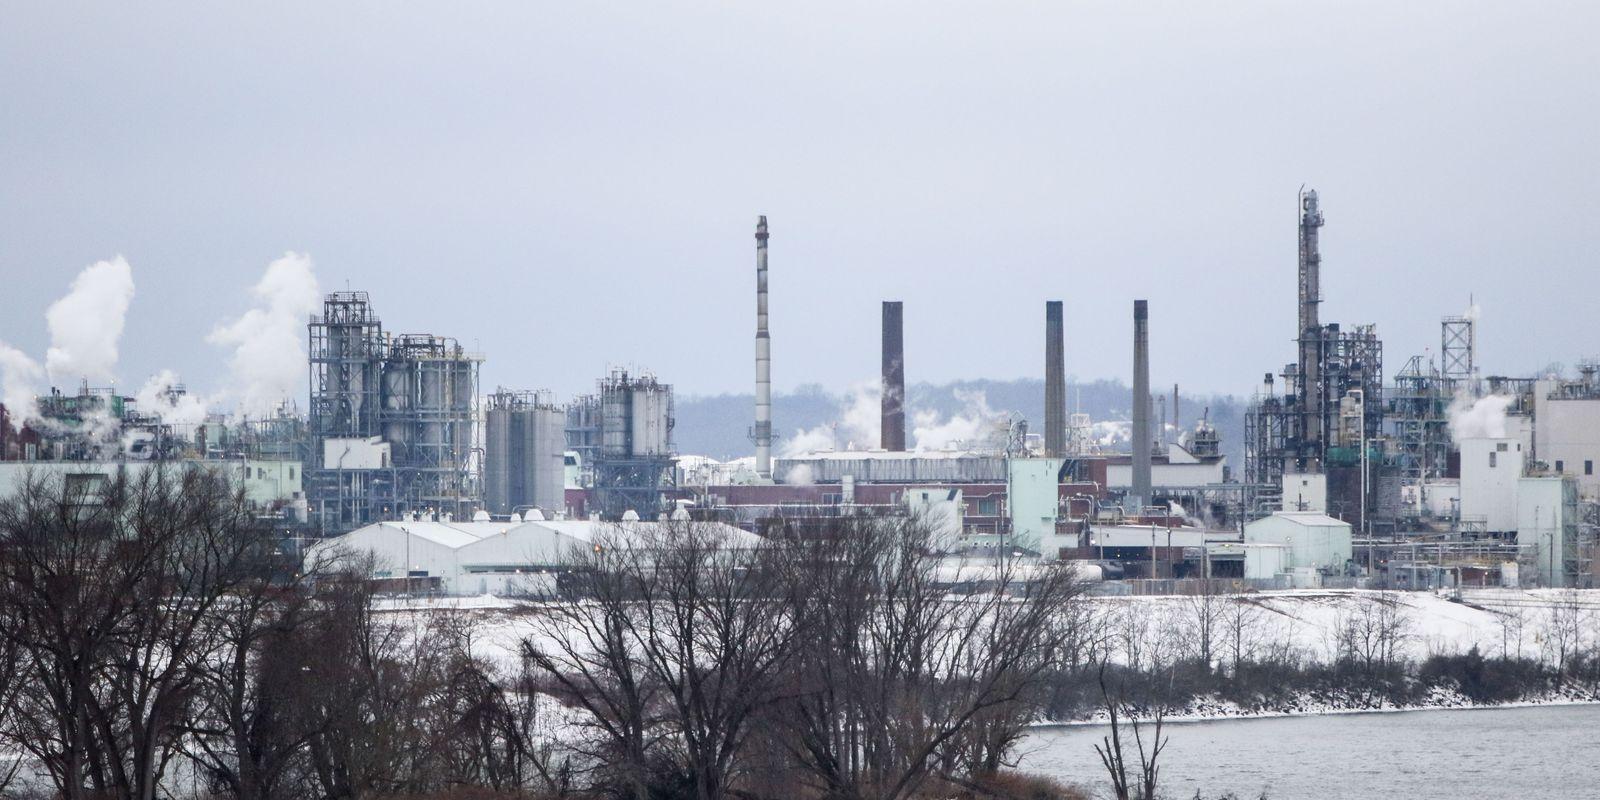 Taking on dupont illnesses deaths blamed on pollution